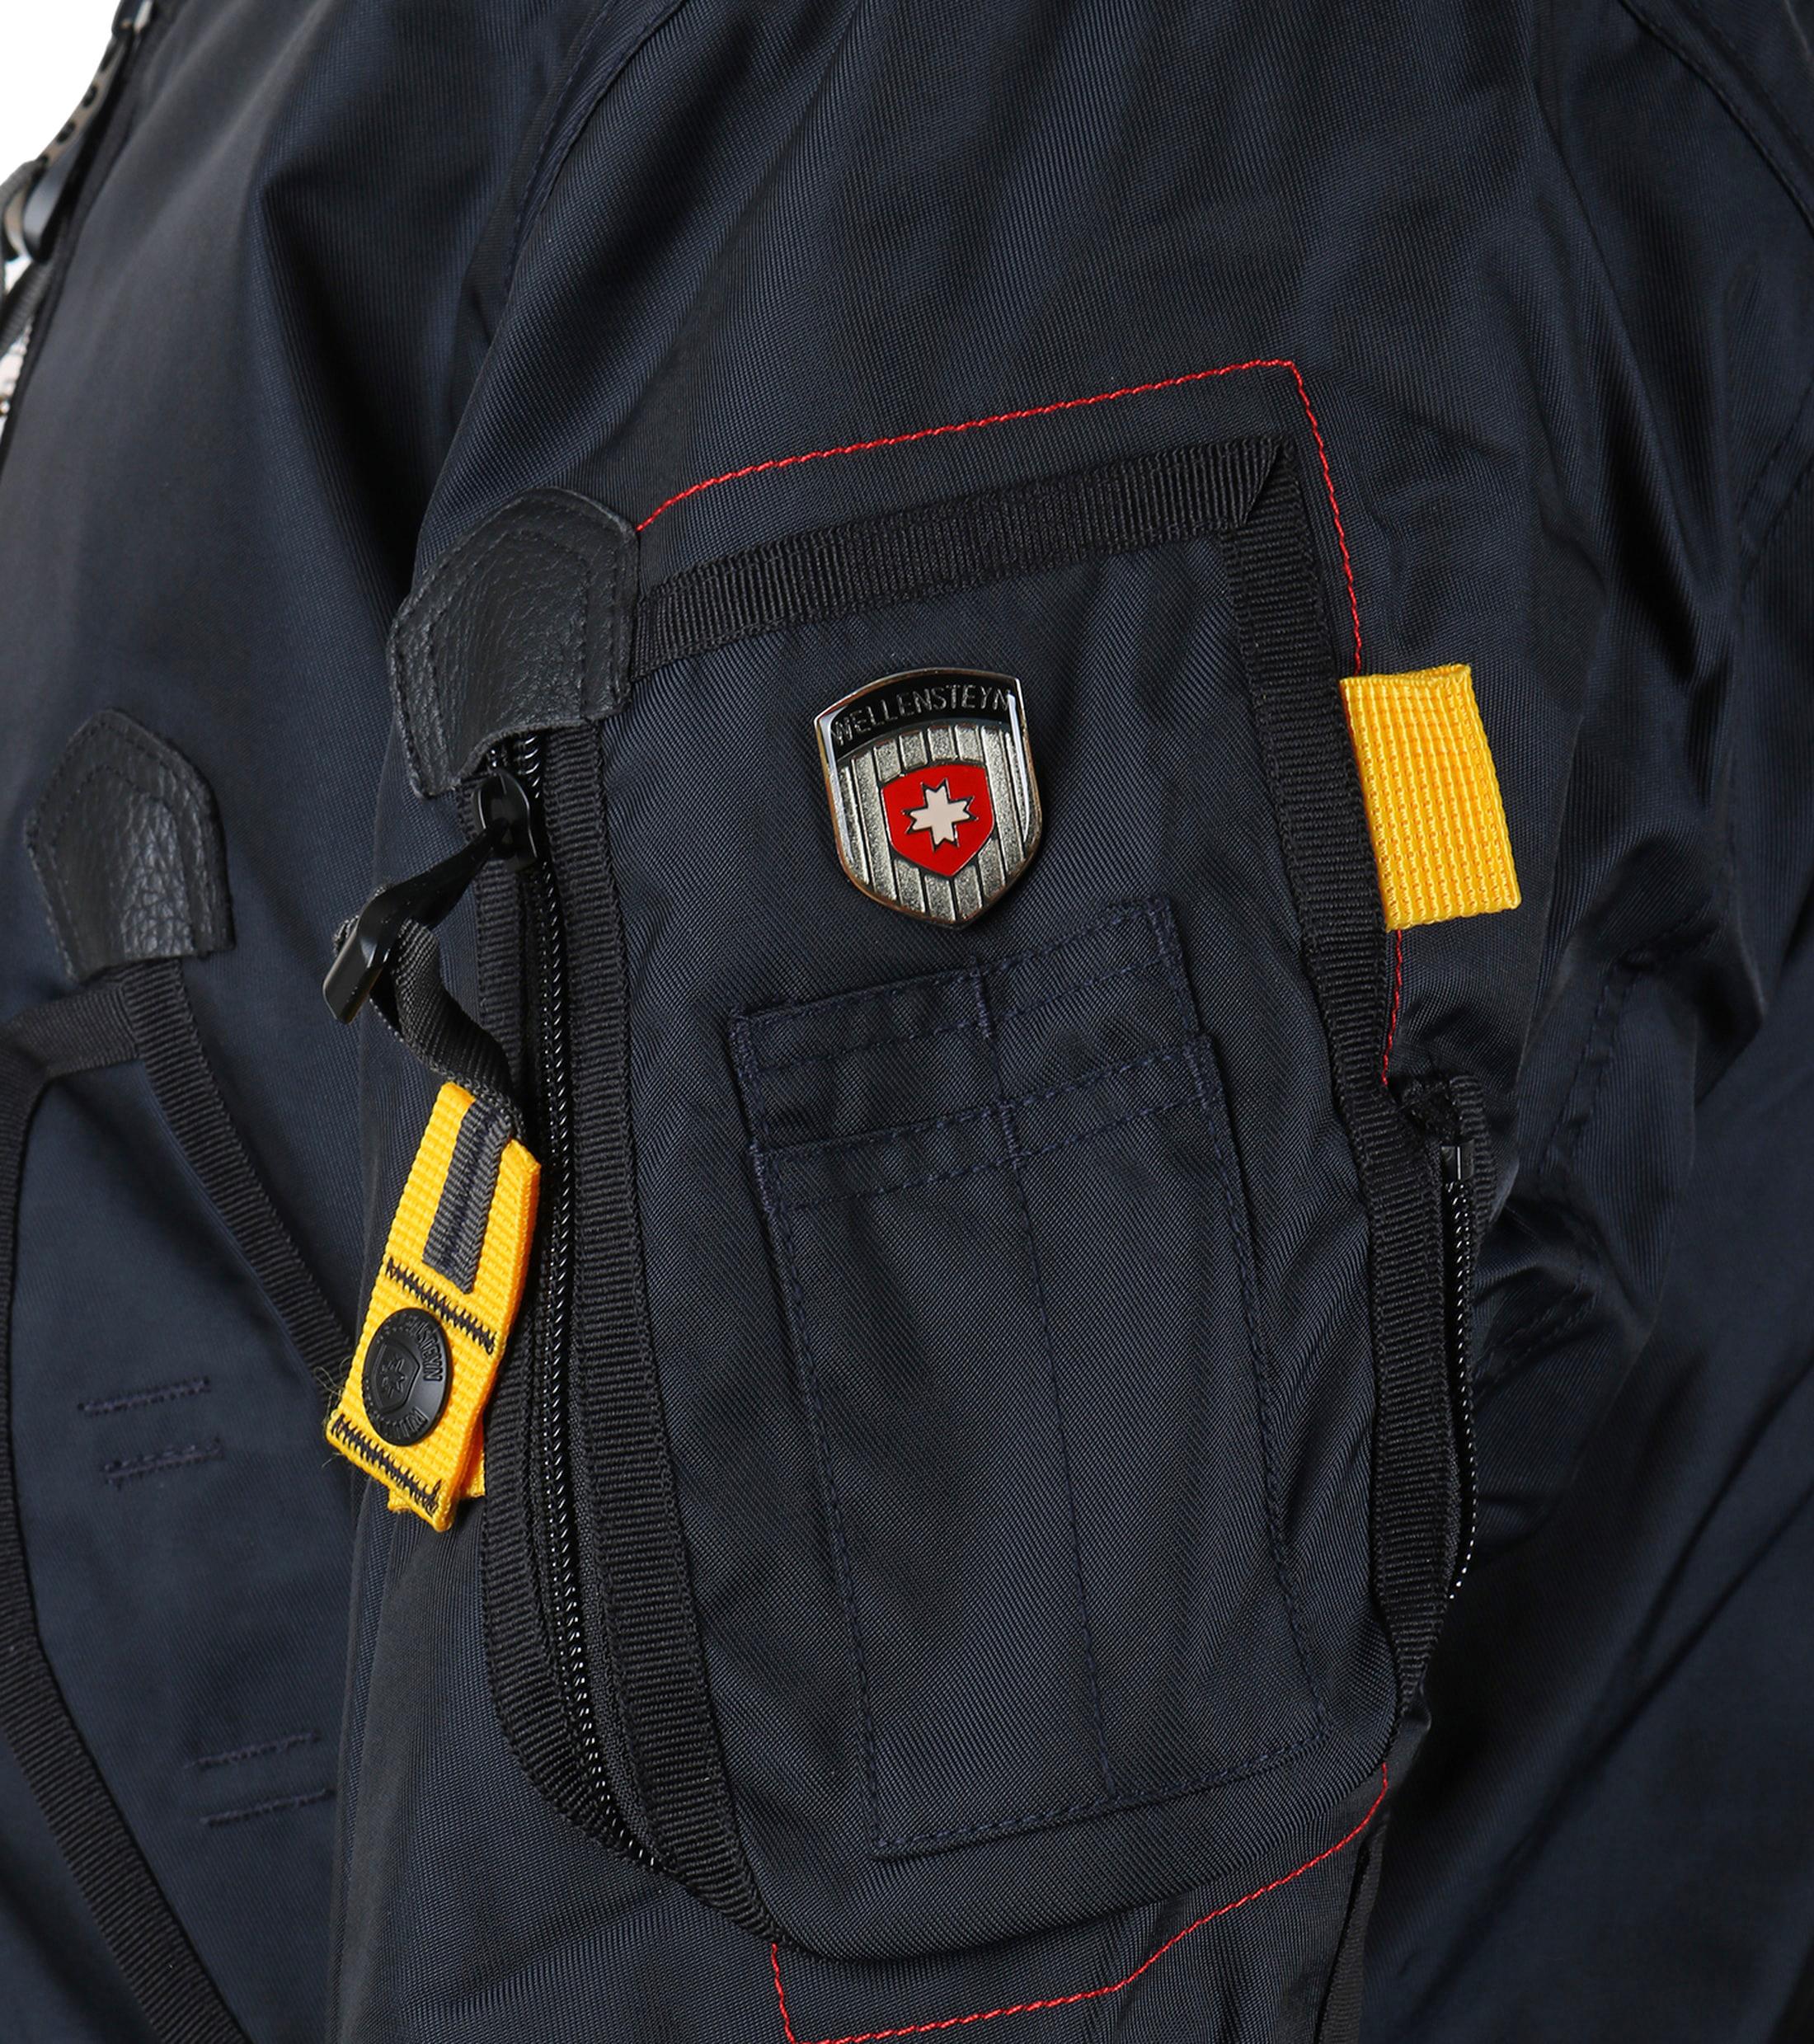 Wellensteyn Rescue Jacket Navy foto 4